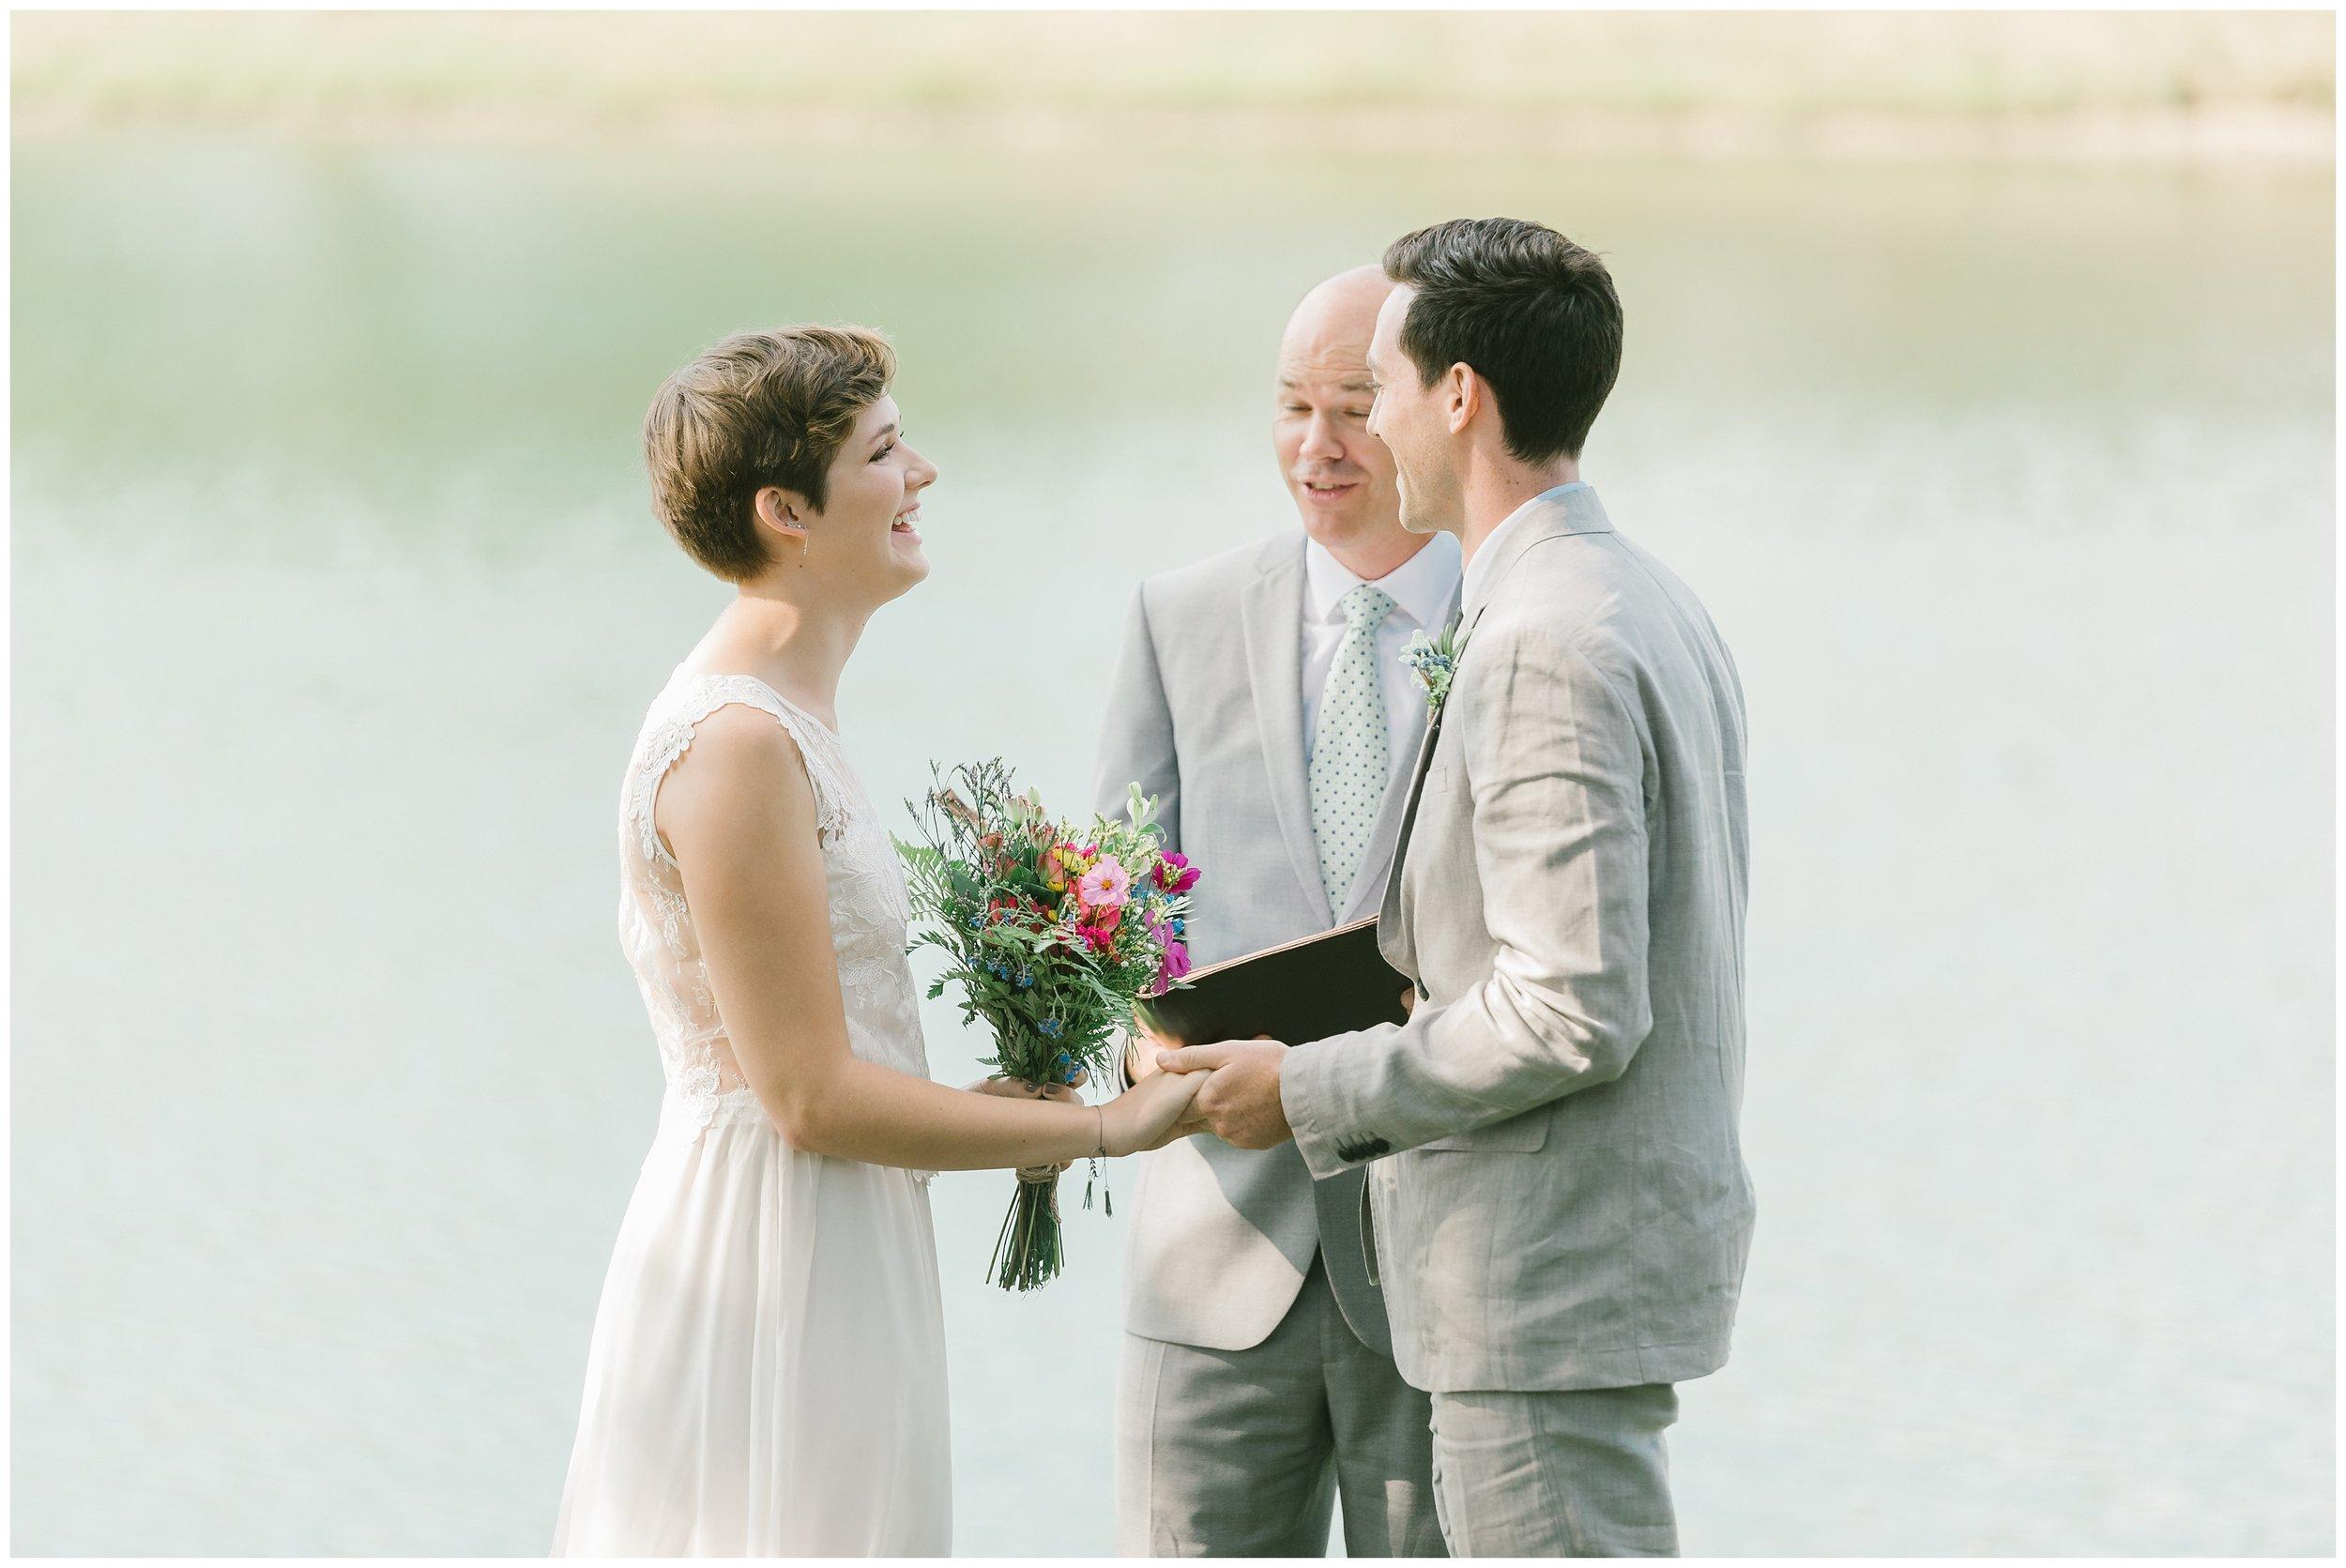 Rebecca_Shehorn_Photography_Indianapolis_Wedding_Photographer_7255.jpg